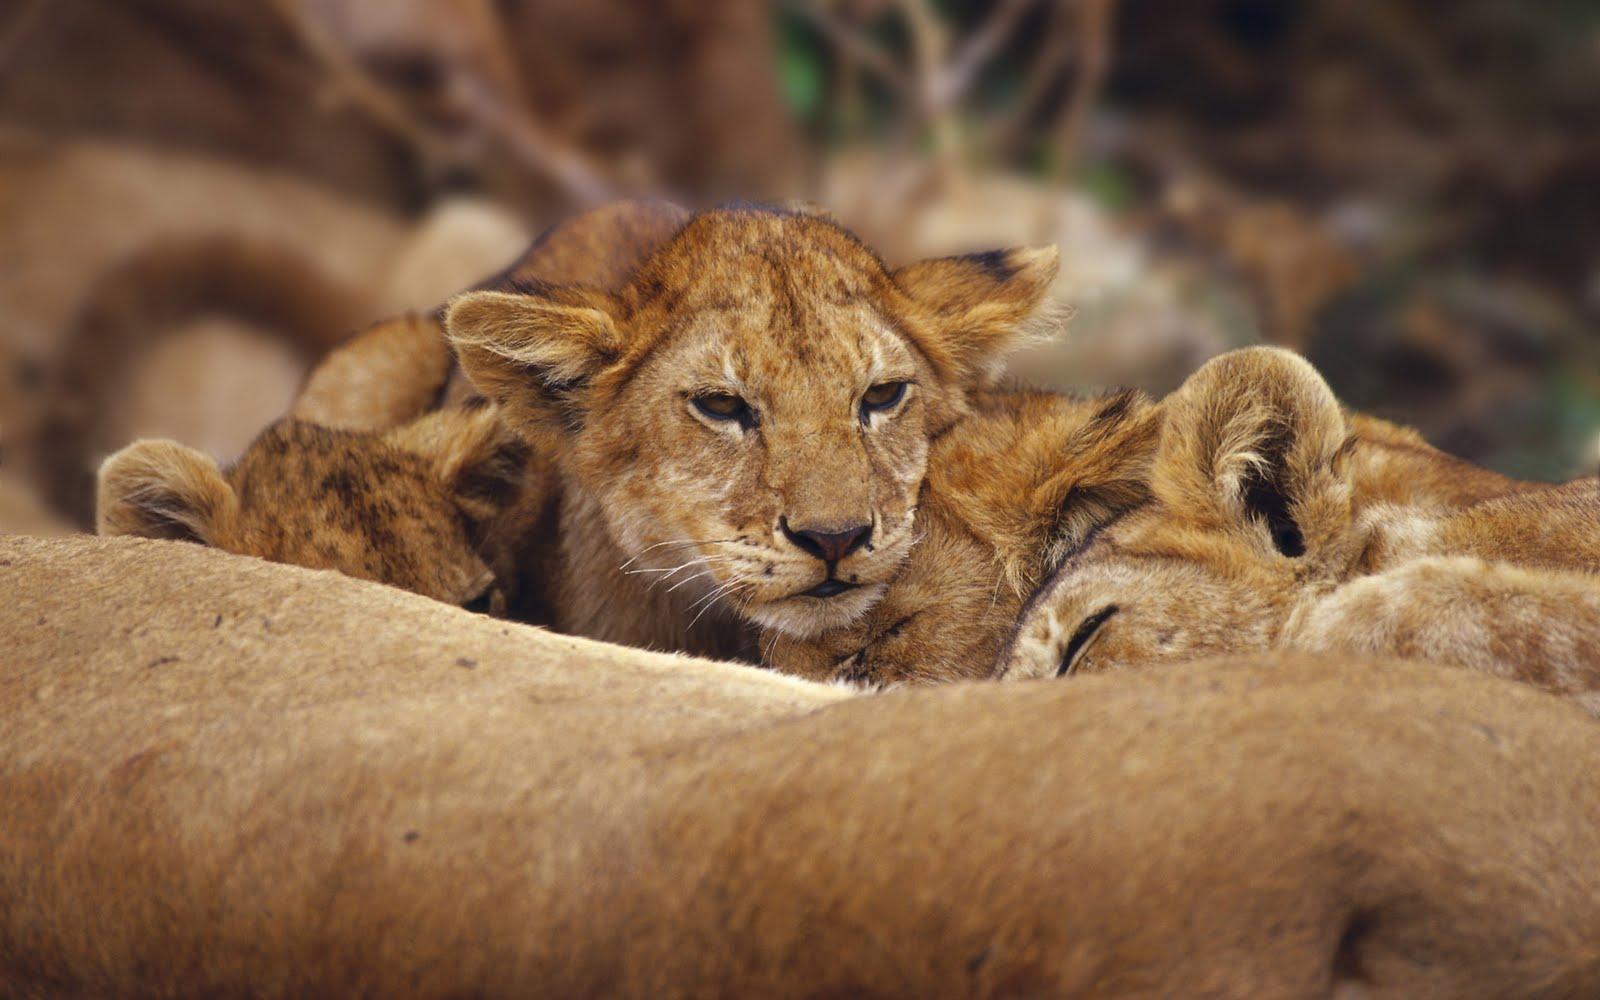 http://1.bp.blogspot.com/-62sEnJLQ-jc/ThFd4XXjtrI/AAAAAAAABf4/81qmN53kuw0/s1600/Wallcate.com+-+Amazing+Wild+Africa+Wallpaper+%252824%2529.jpg